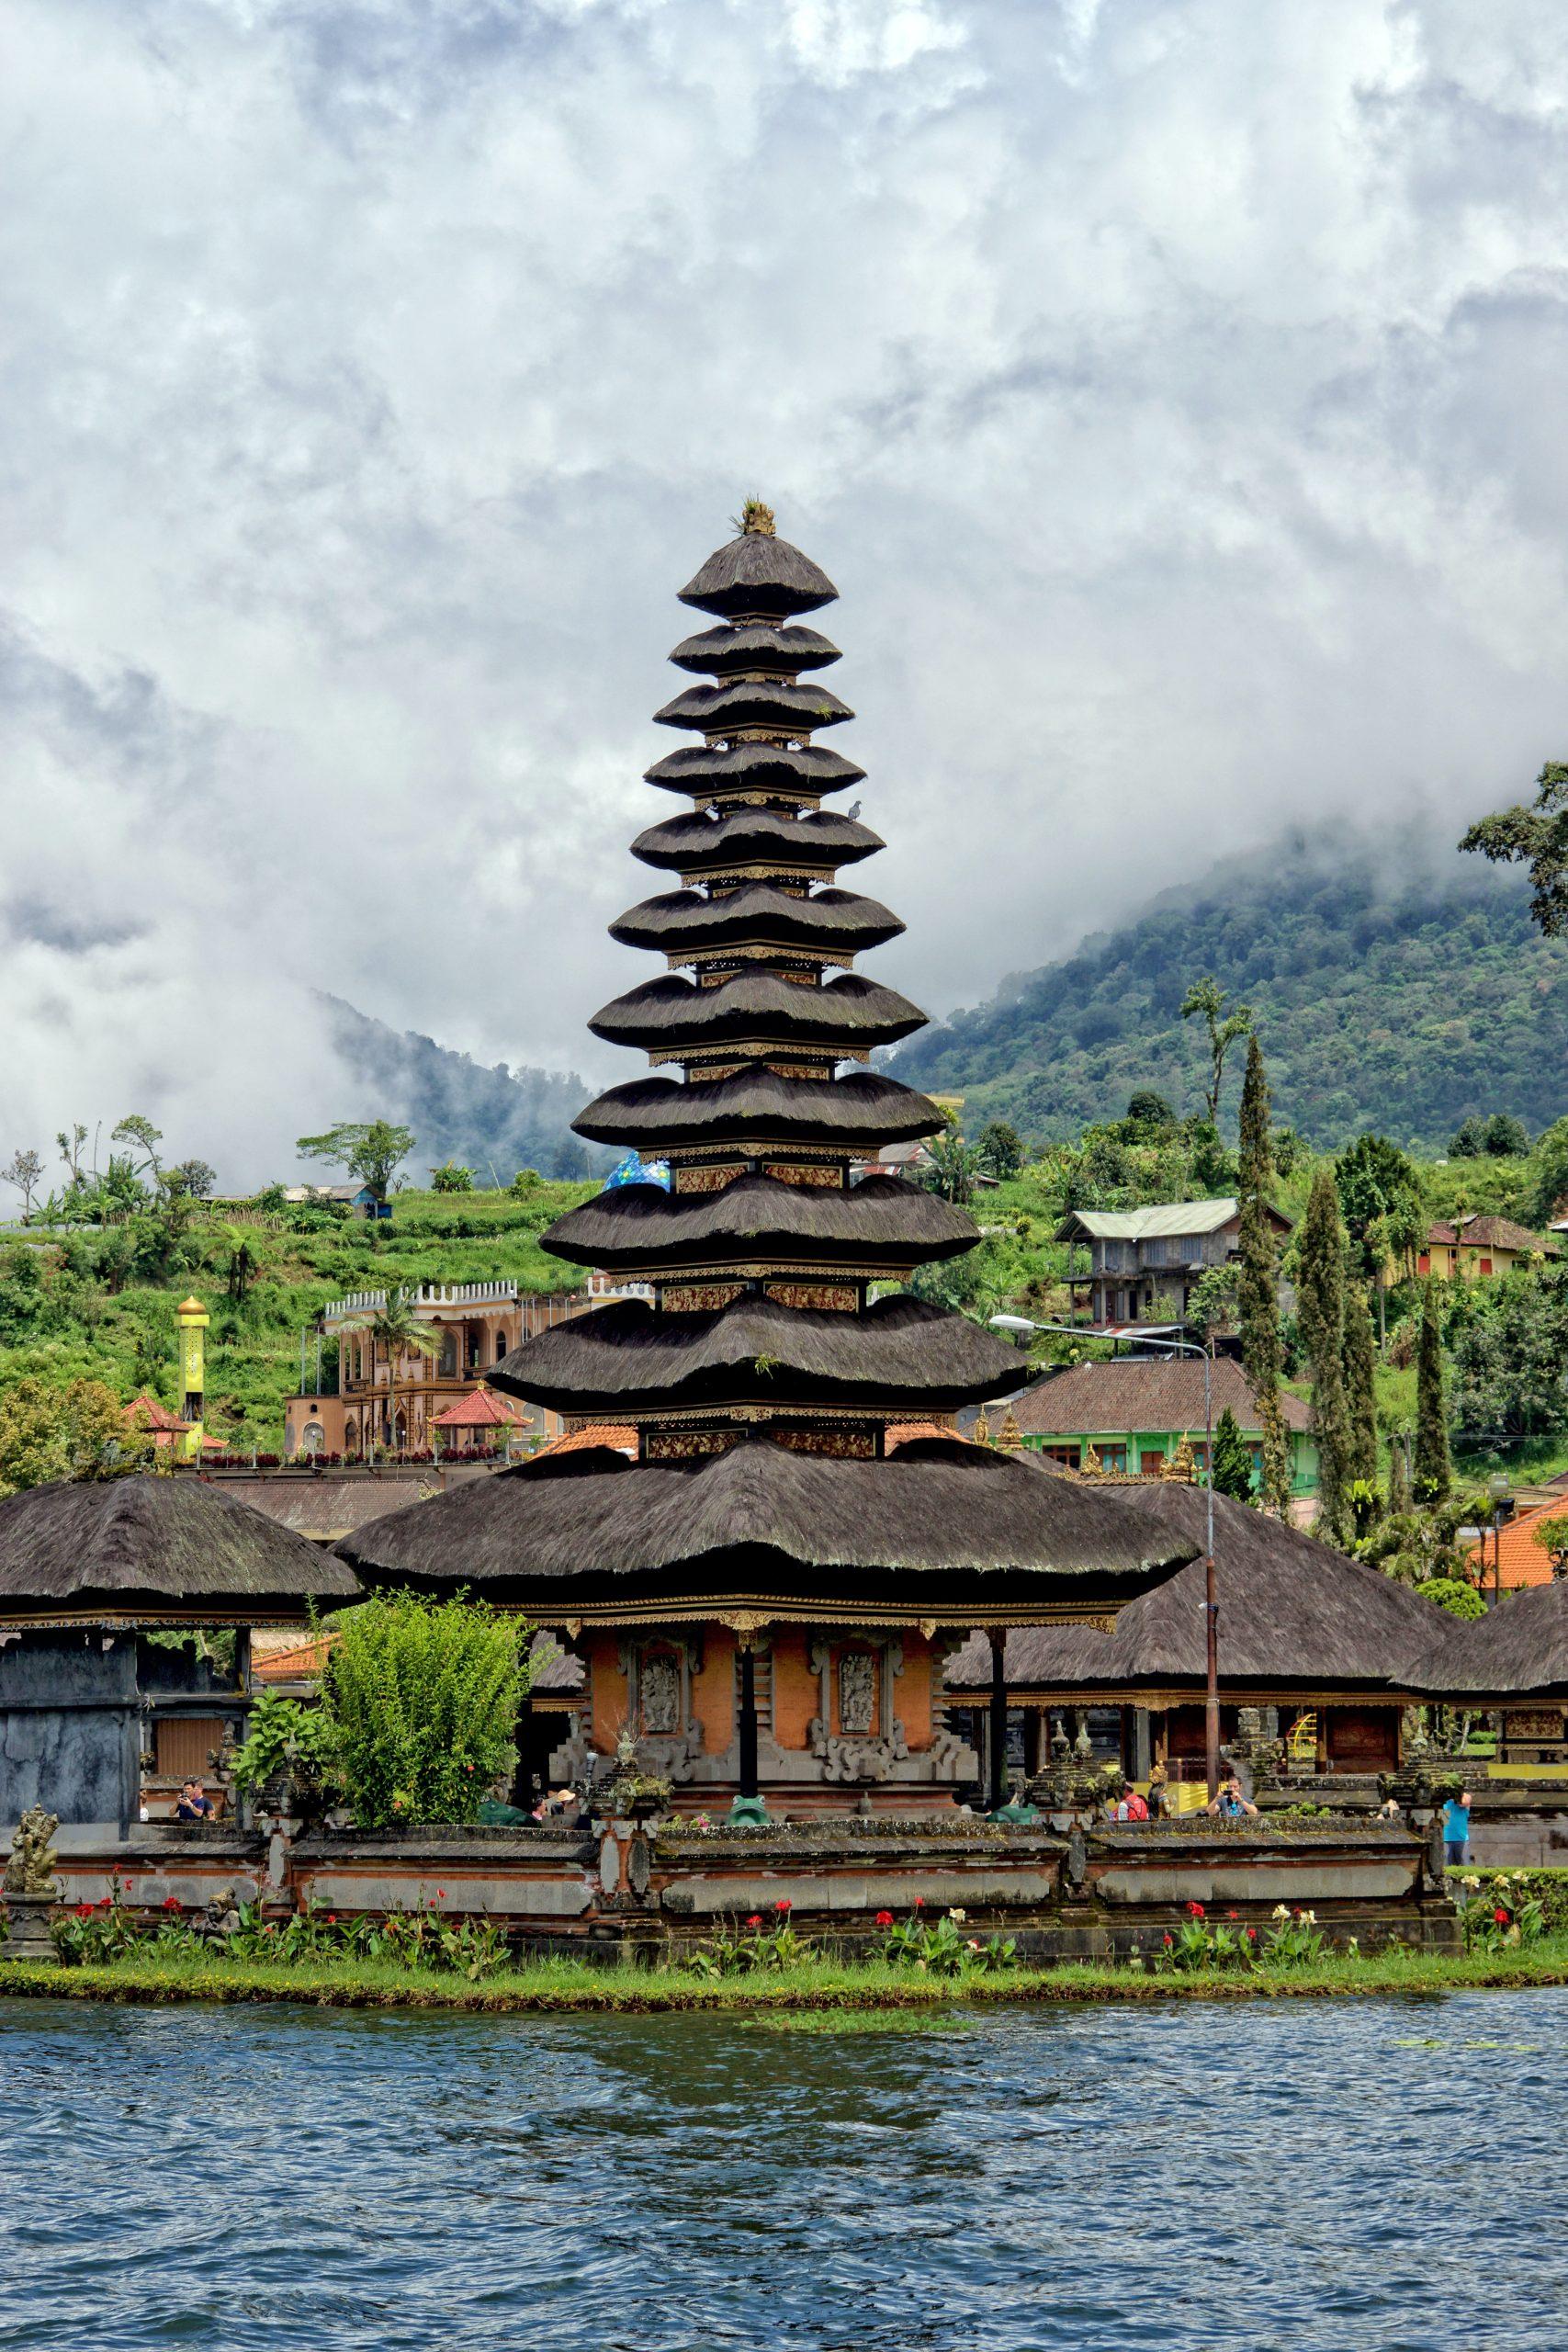 bali turismo templos